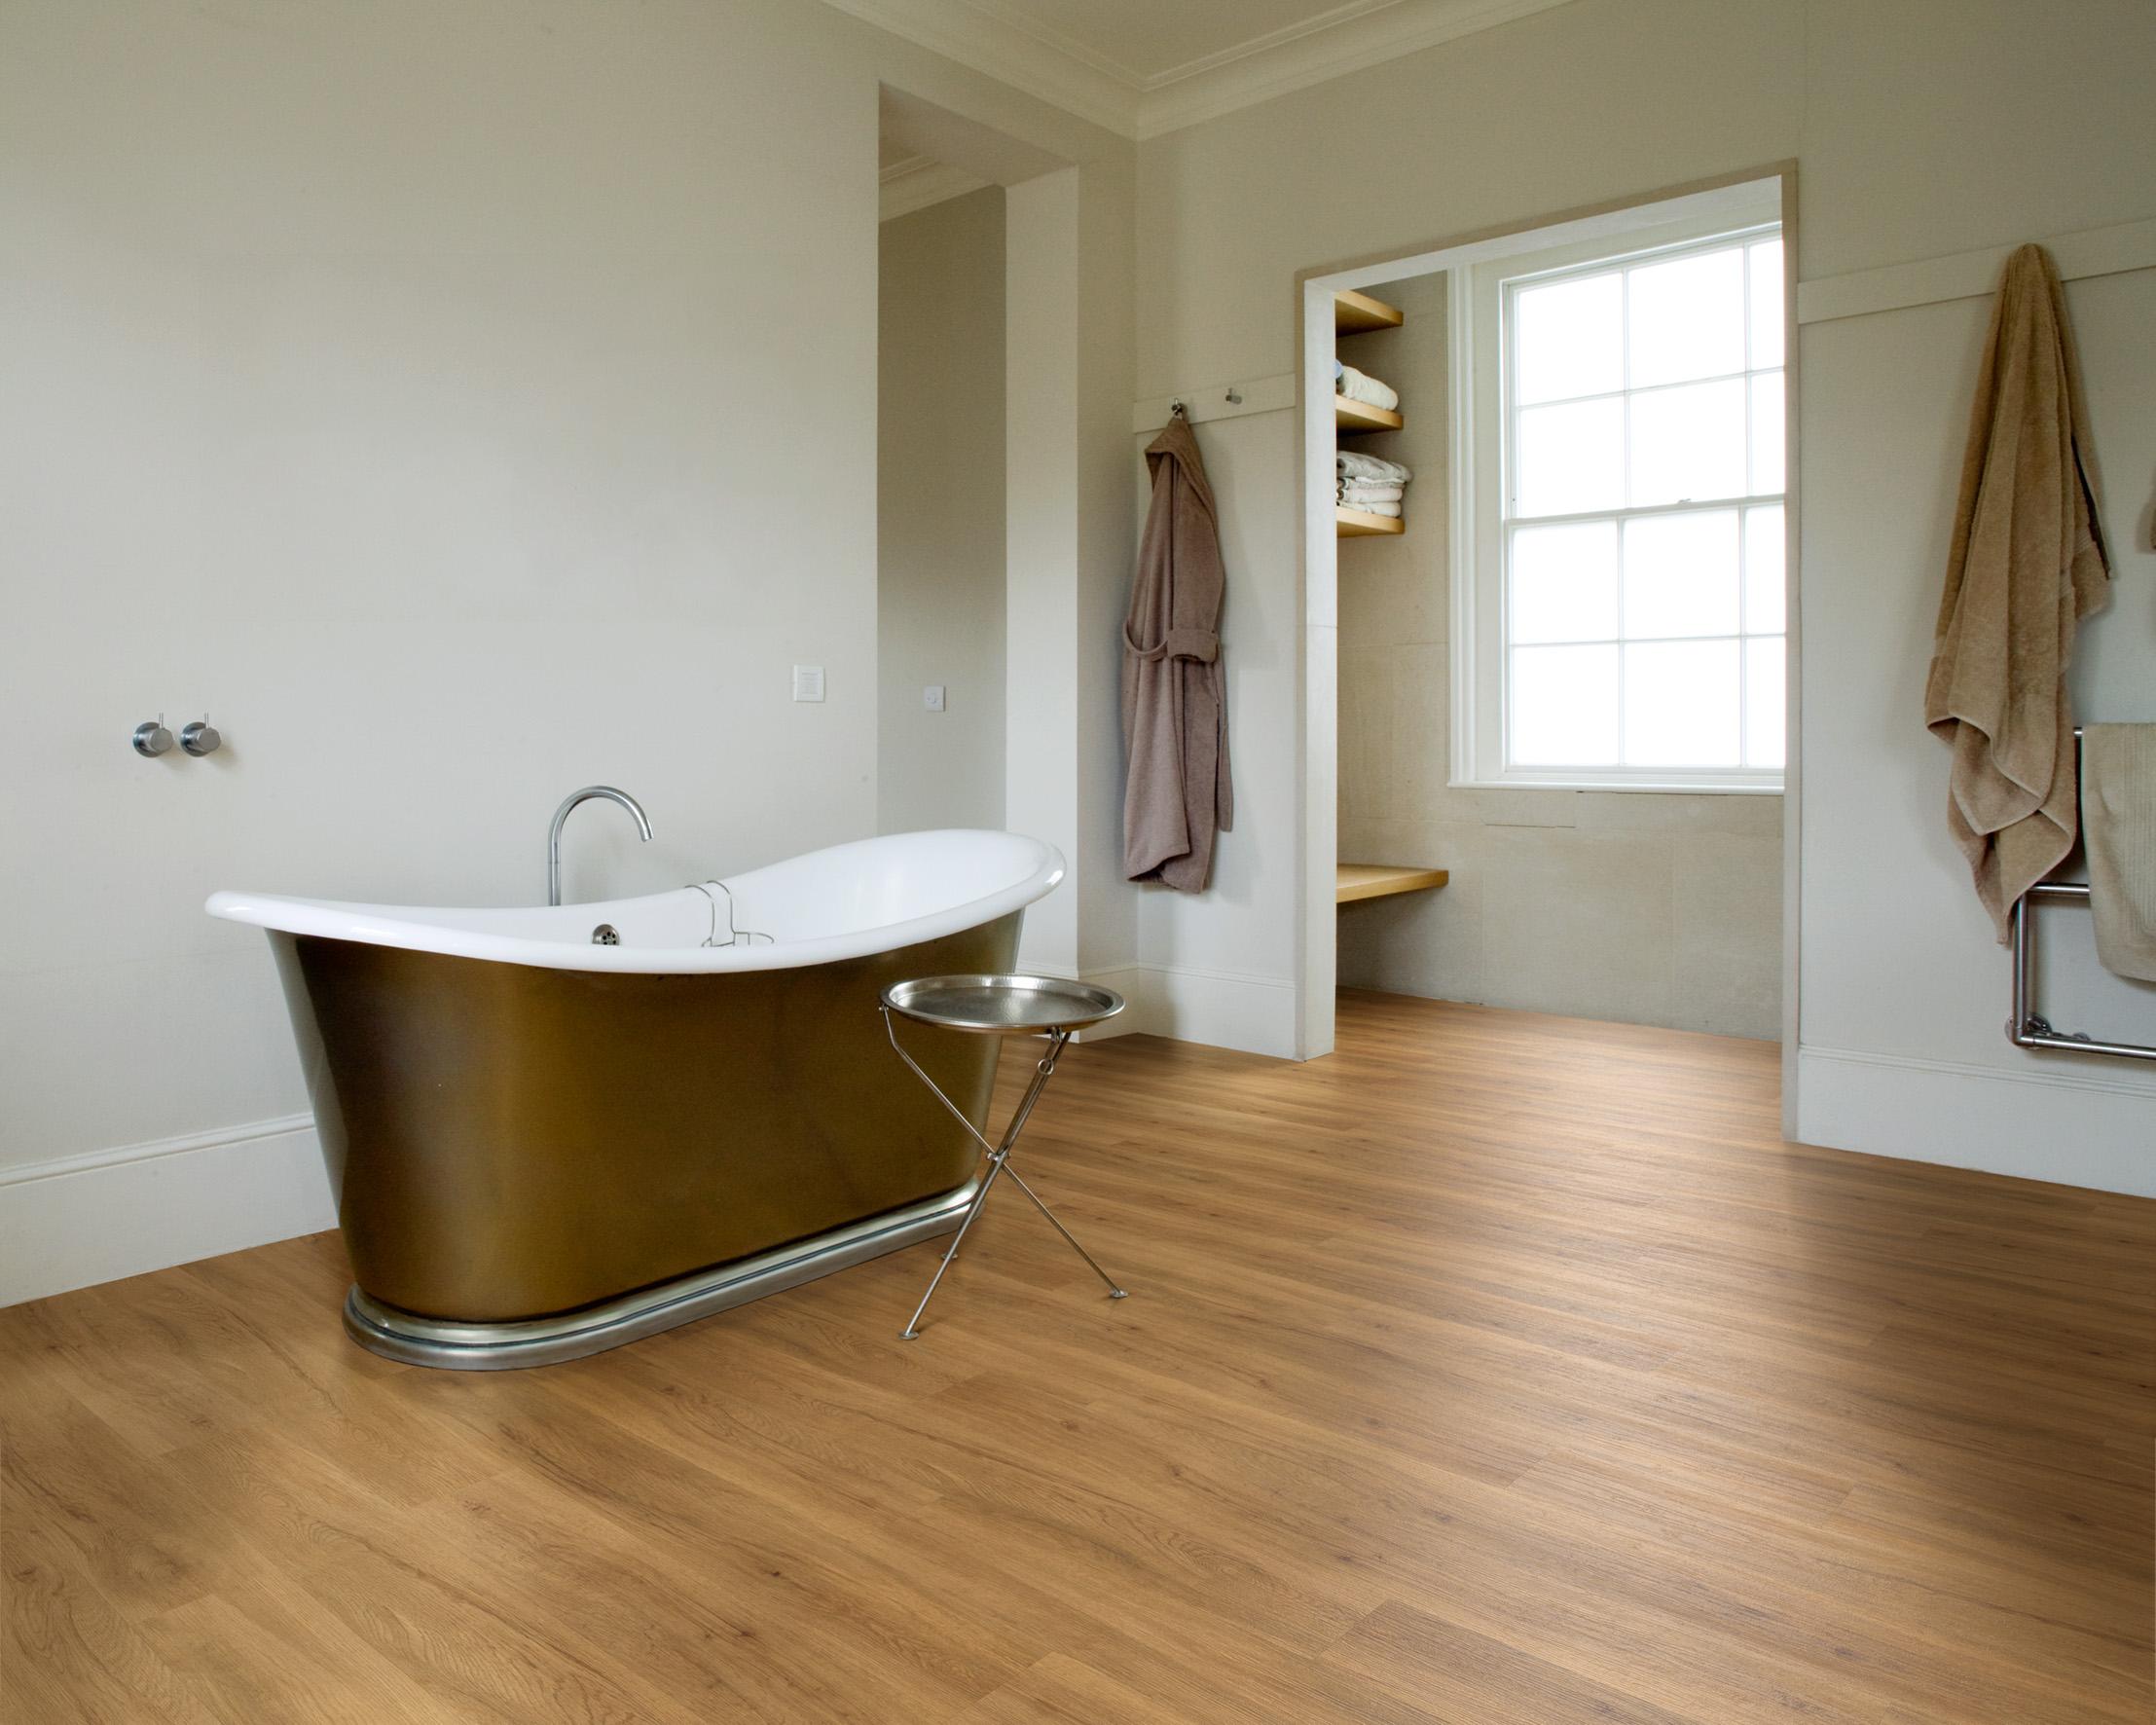 Bathrooms Polyflor At Home